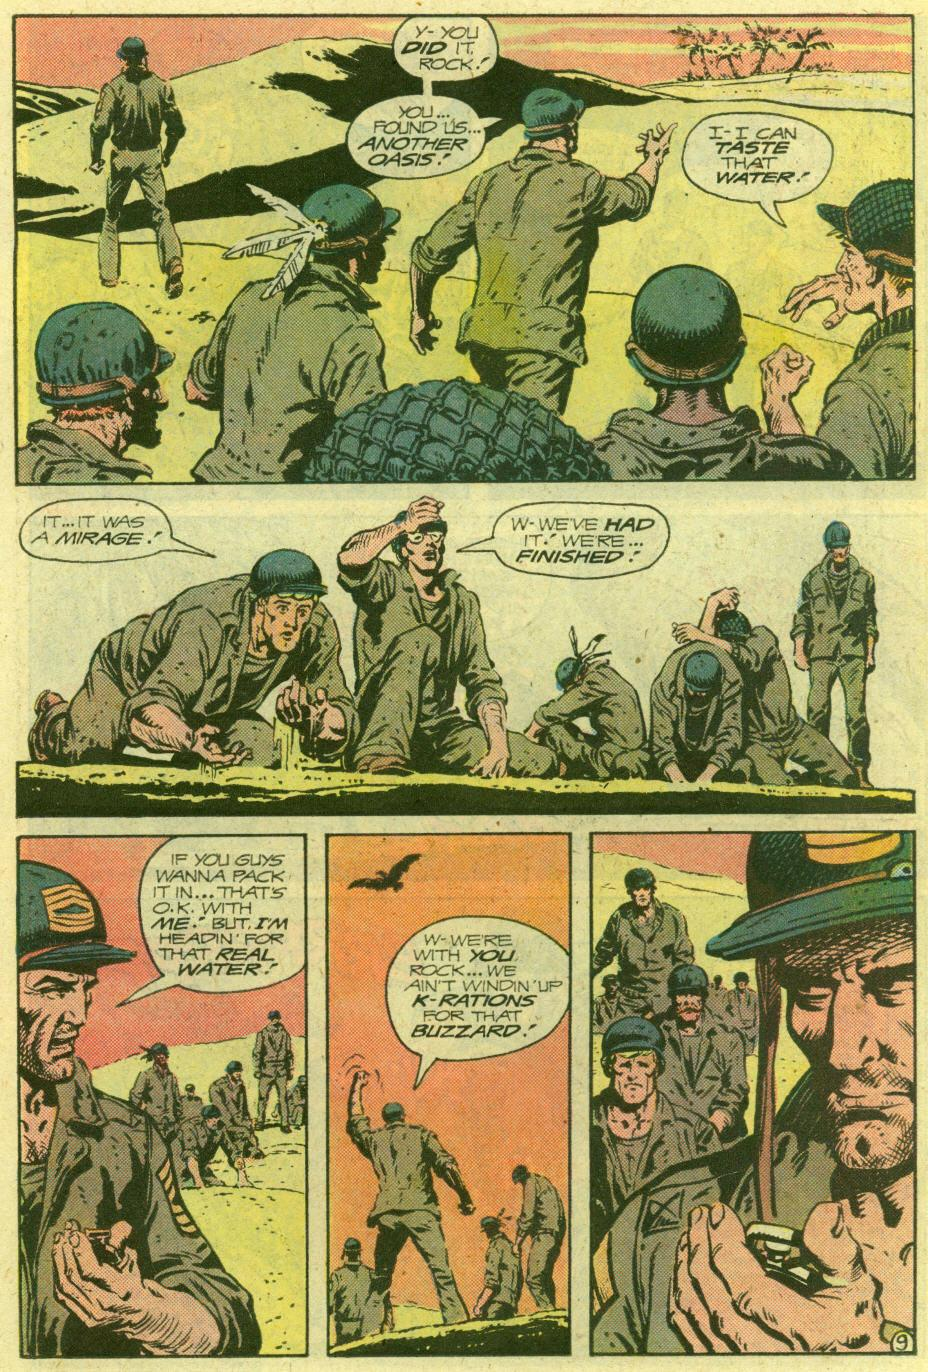 Read online Sgt. Rock comic -  Issue #335 - 16